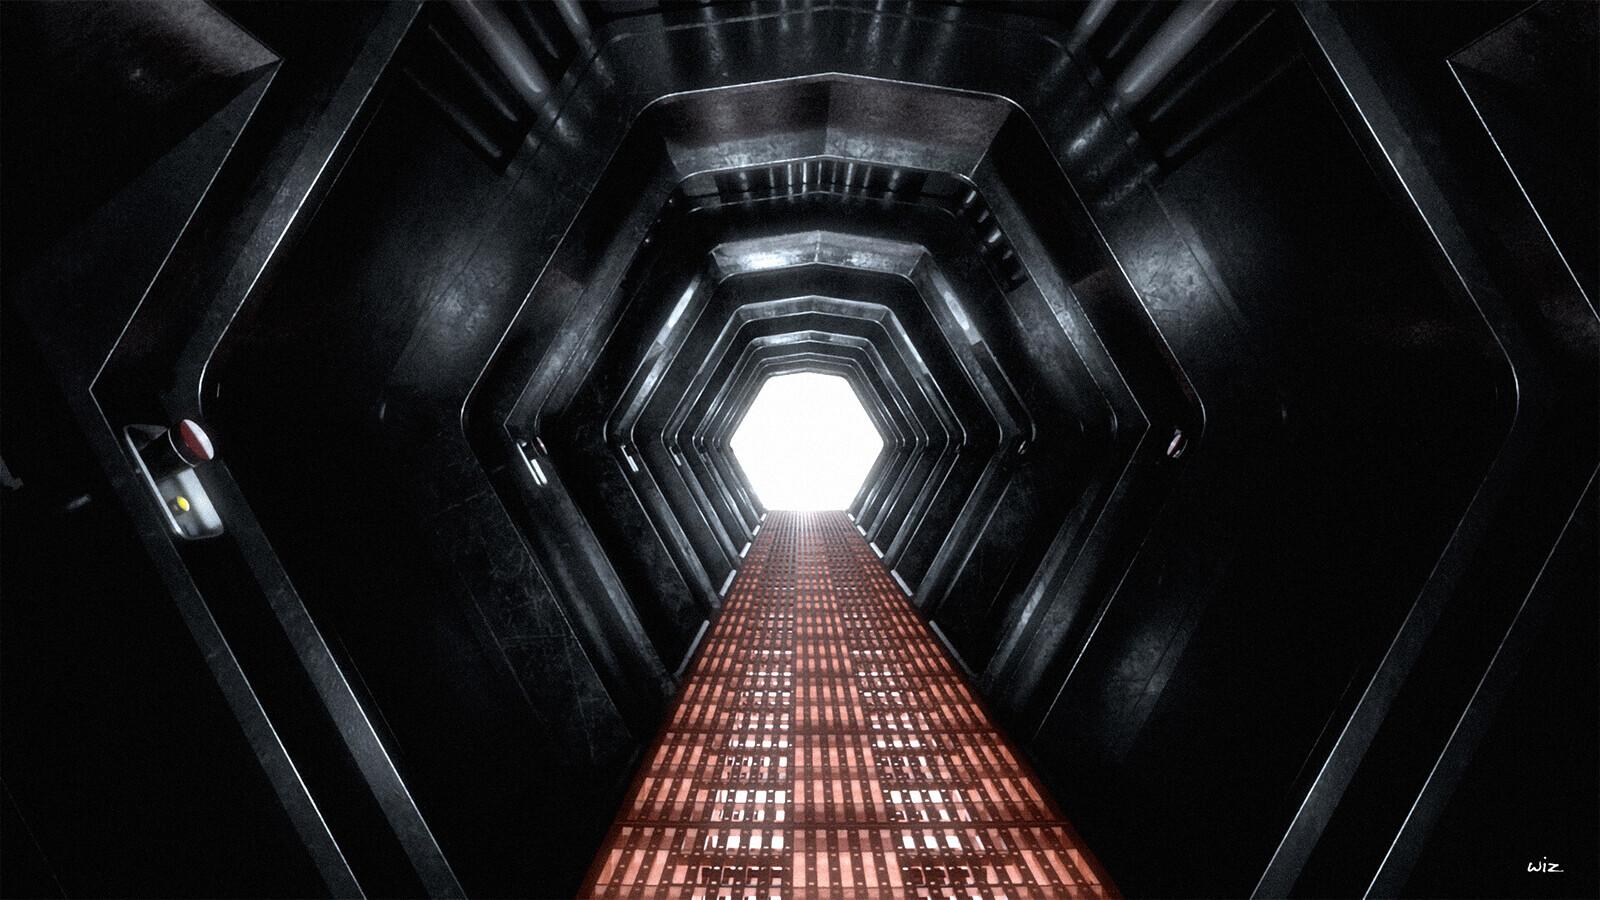 Paul wiz johnson detention block corridor